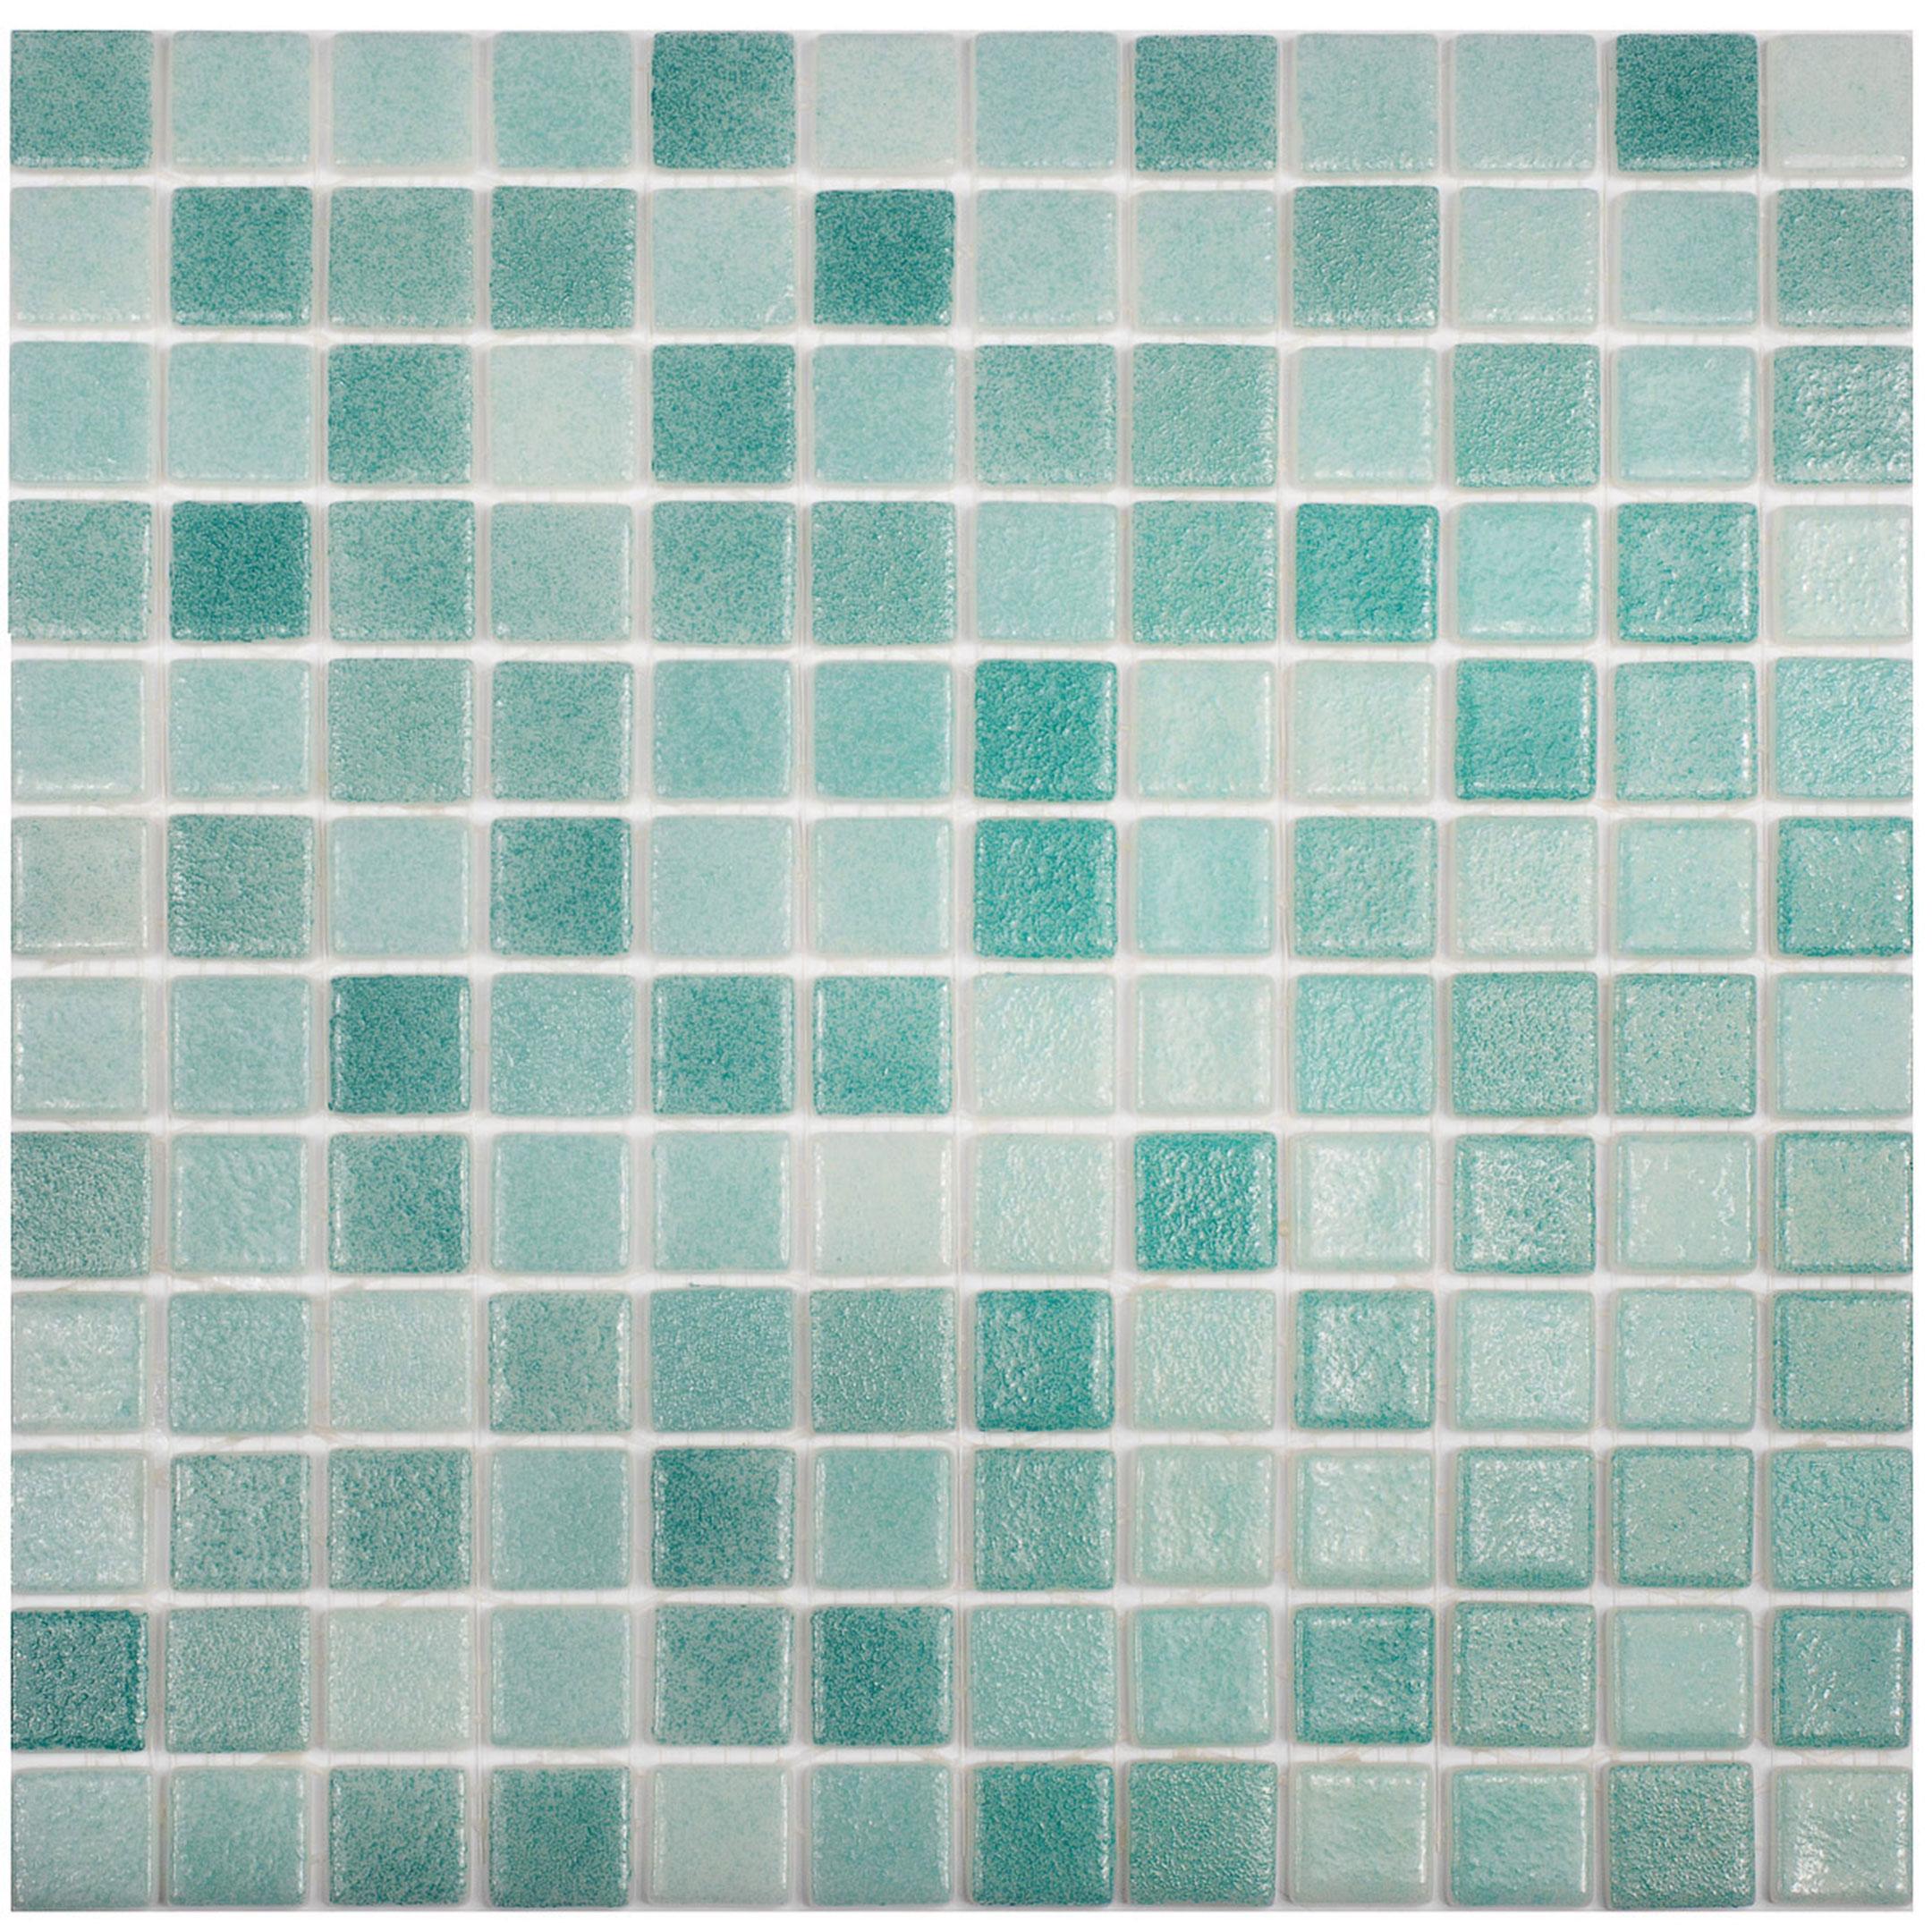 цена на Мозаика Vidrepur Antid № 503/516 микс зеленый стеклянная 317х317х4 мм